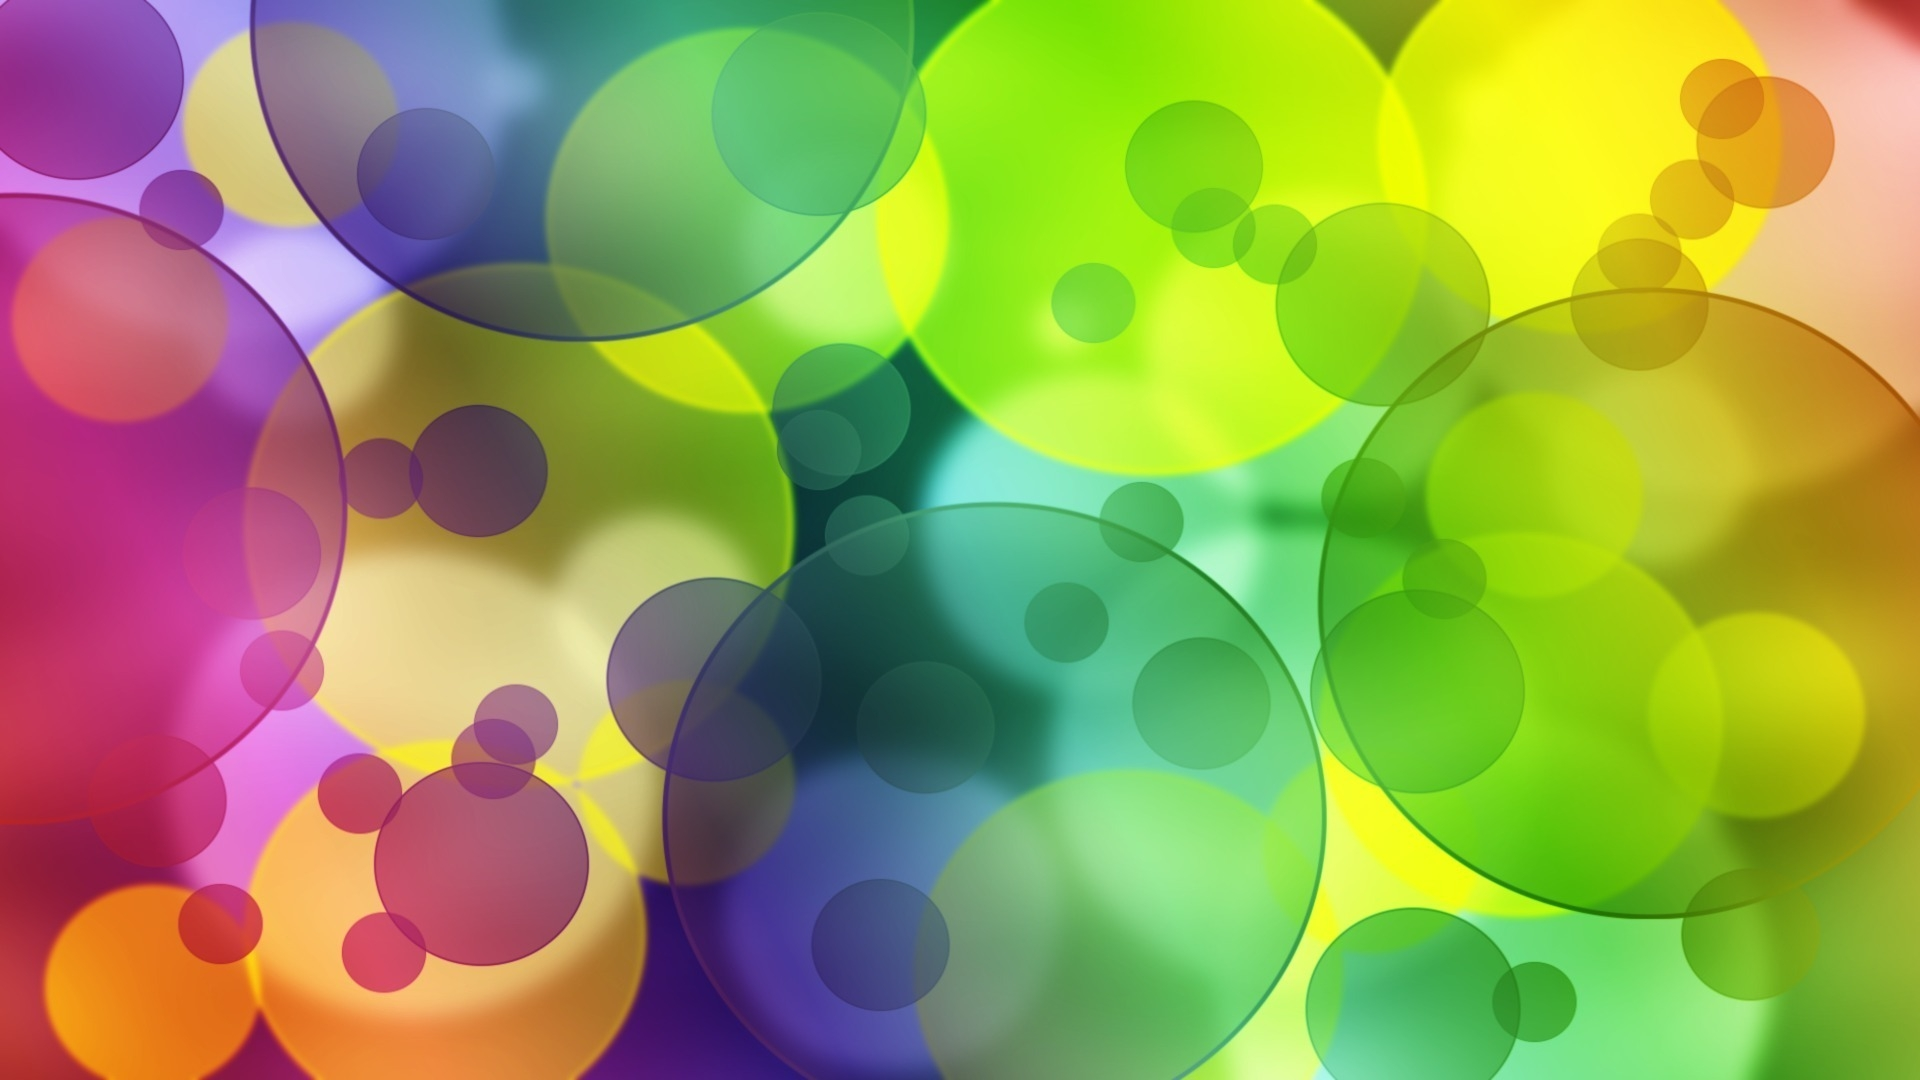 colorful bubbles wallpaper 46067 1920x1080 px ~ hdwallsource